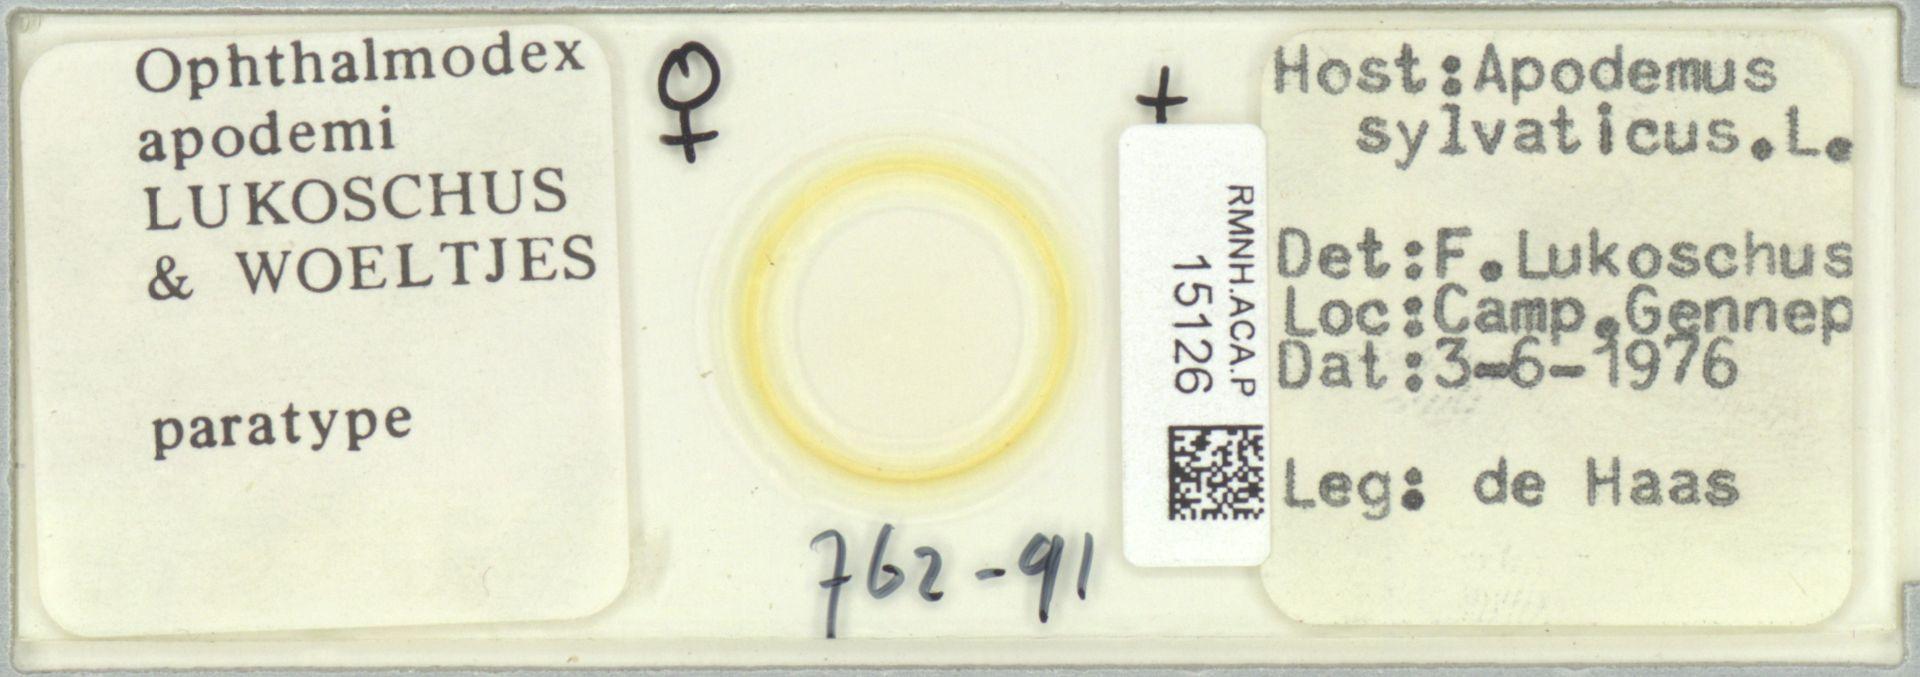 RMNH.ACA.P.15126 | Ophthalmodex apodemi Lukoschus & Woeltjes